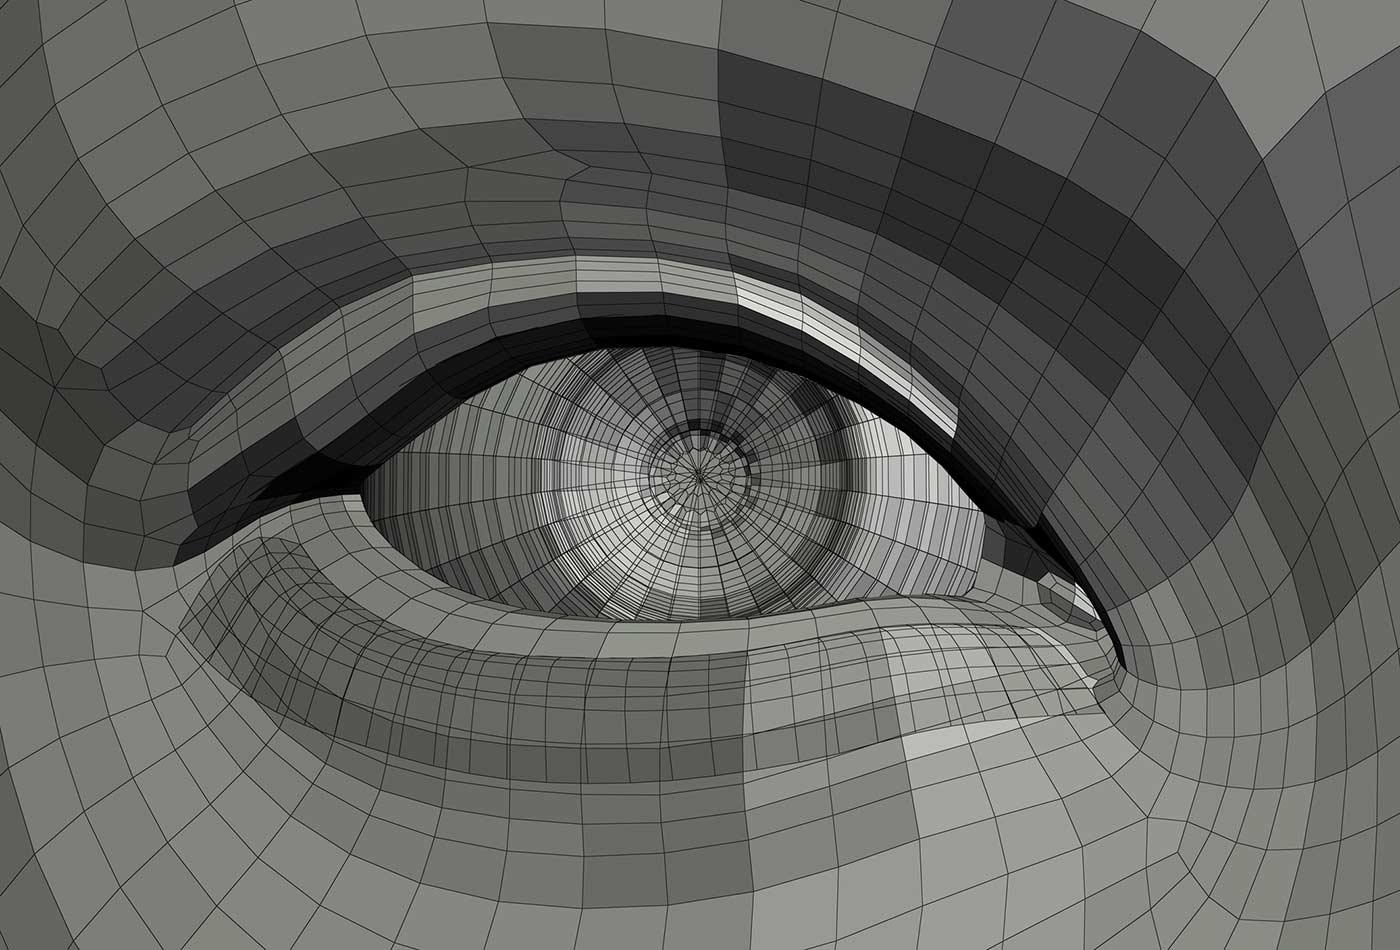 Mechanical eye illustration,